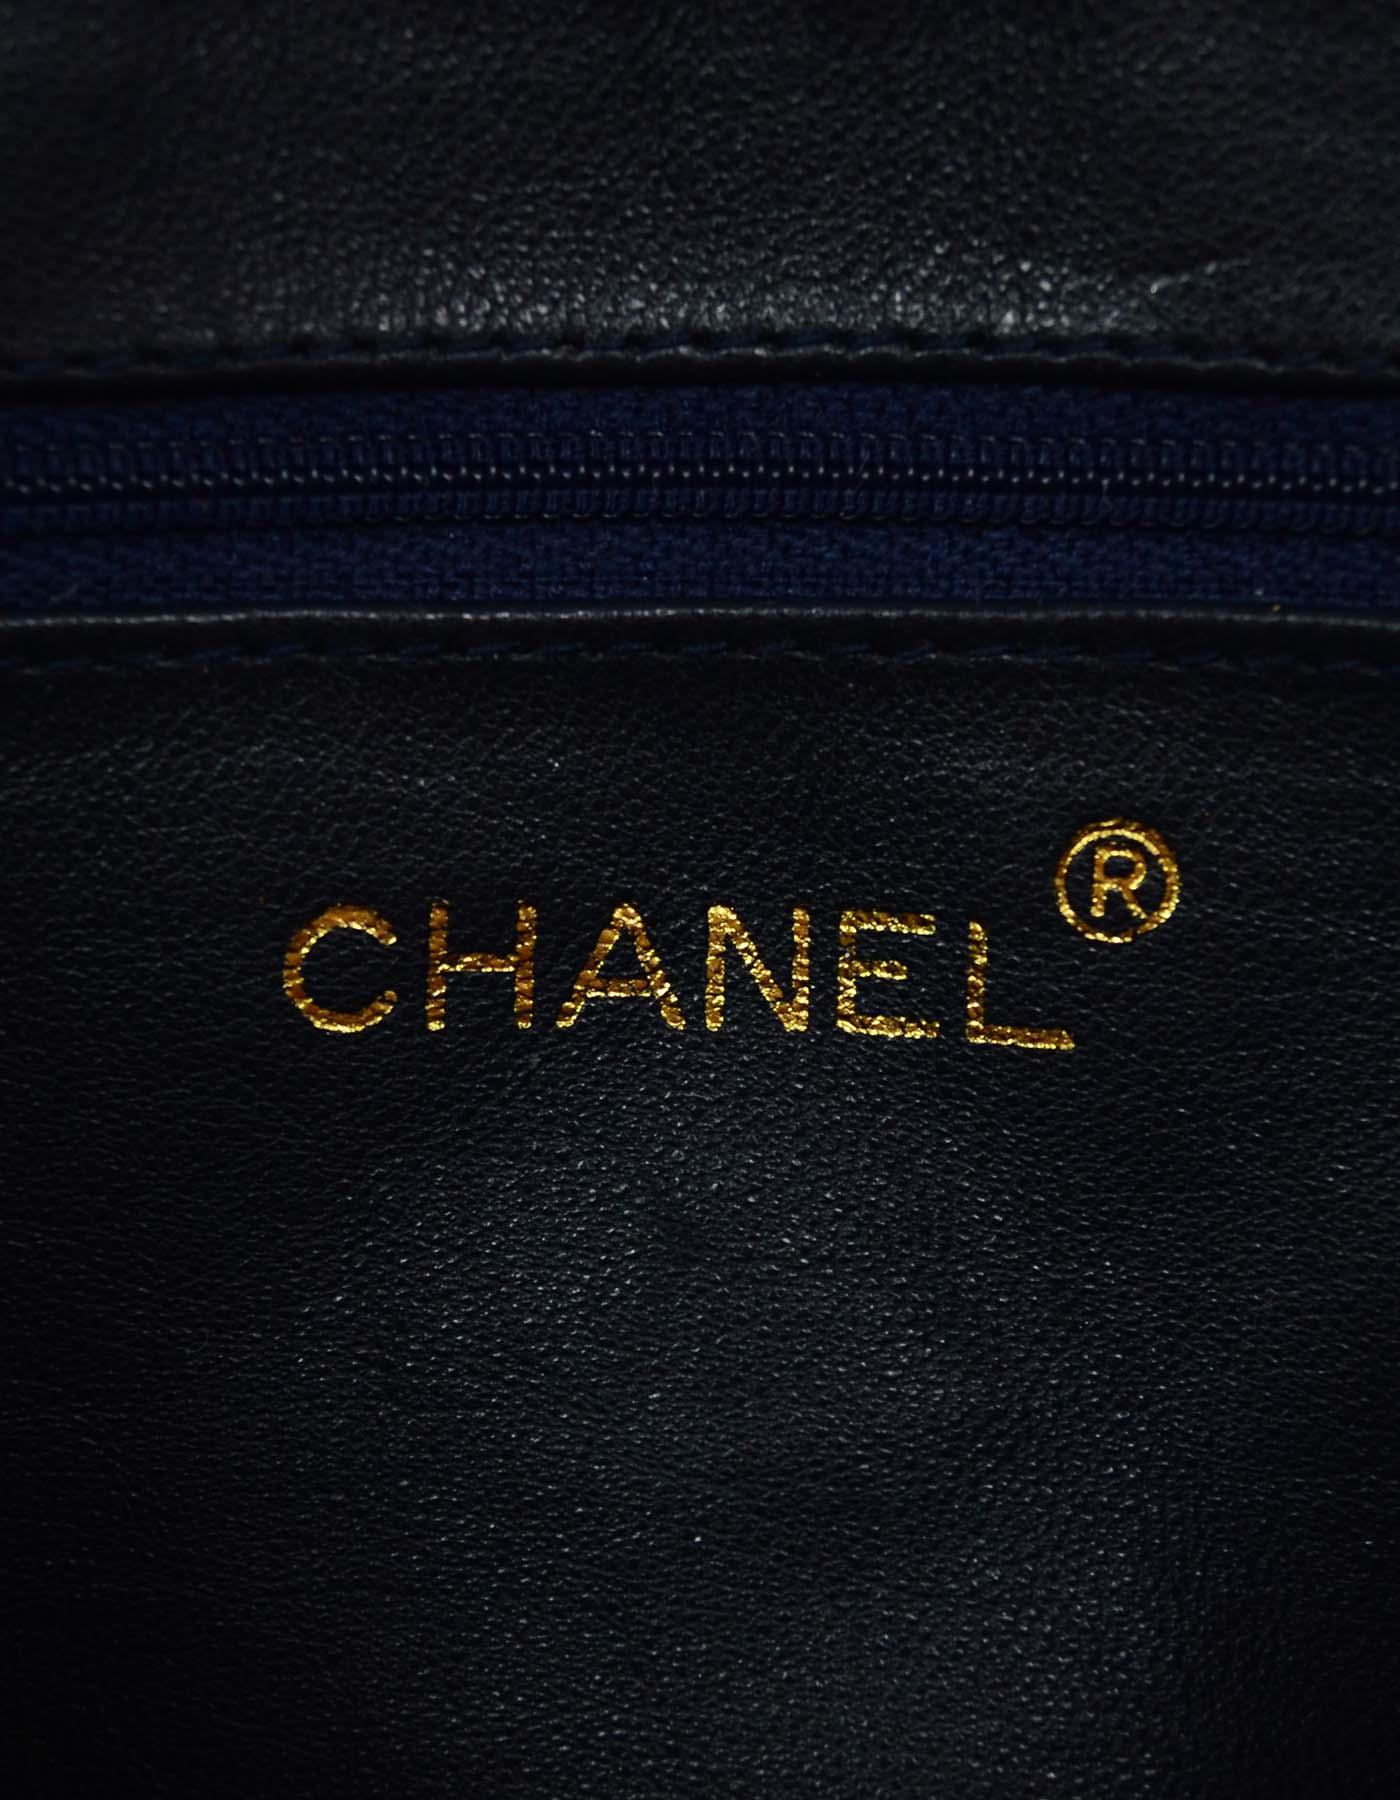 19bd4cc38ebc Chanel Vintage Navy Lizard Skin CC Camera Crossbody Bag GHW For Sale at  1stdibs